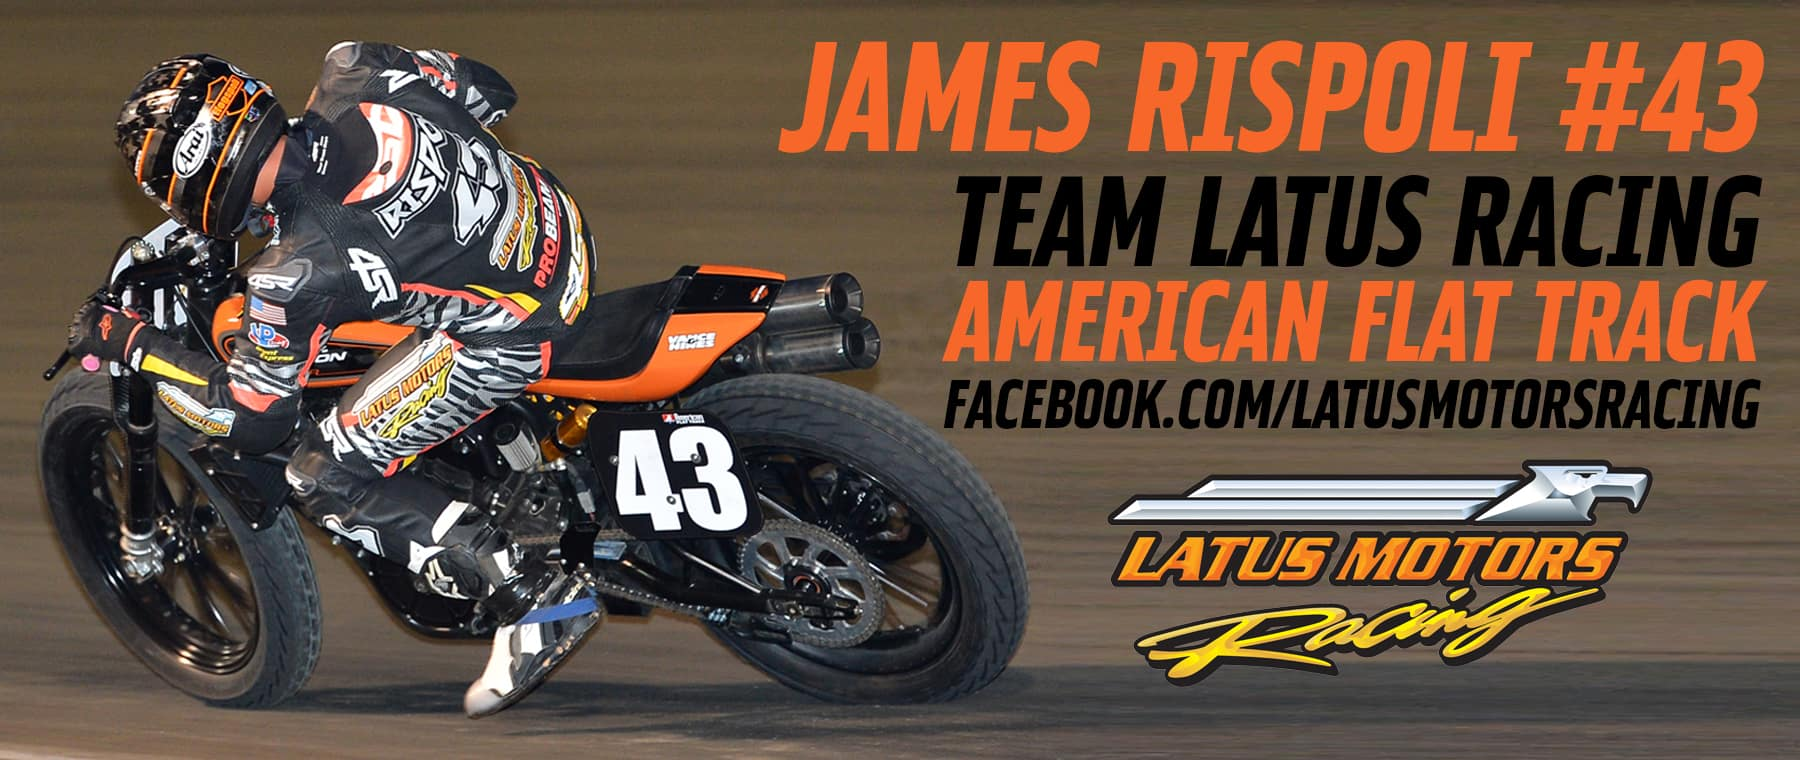 Rider James Rispoli on the Latus Motors Racing Flat Track machine